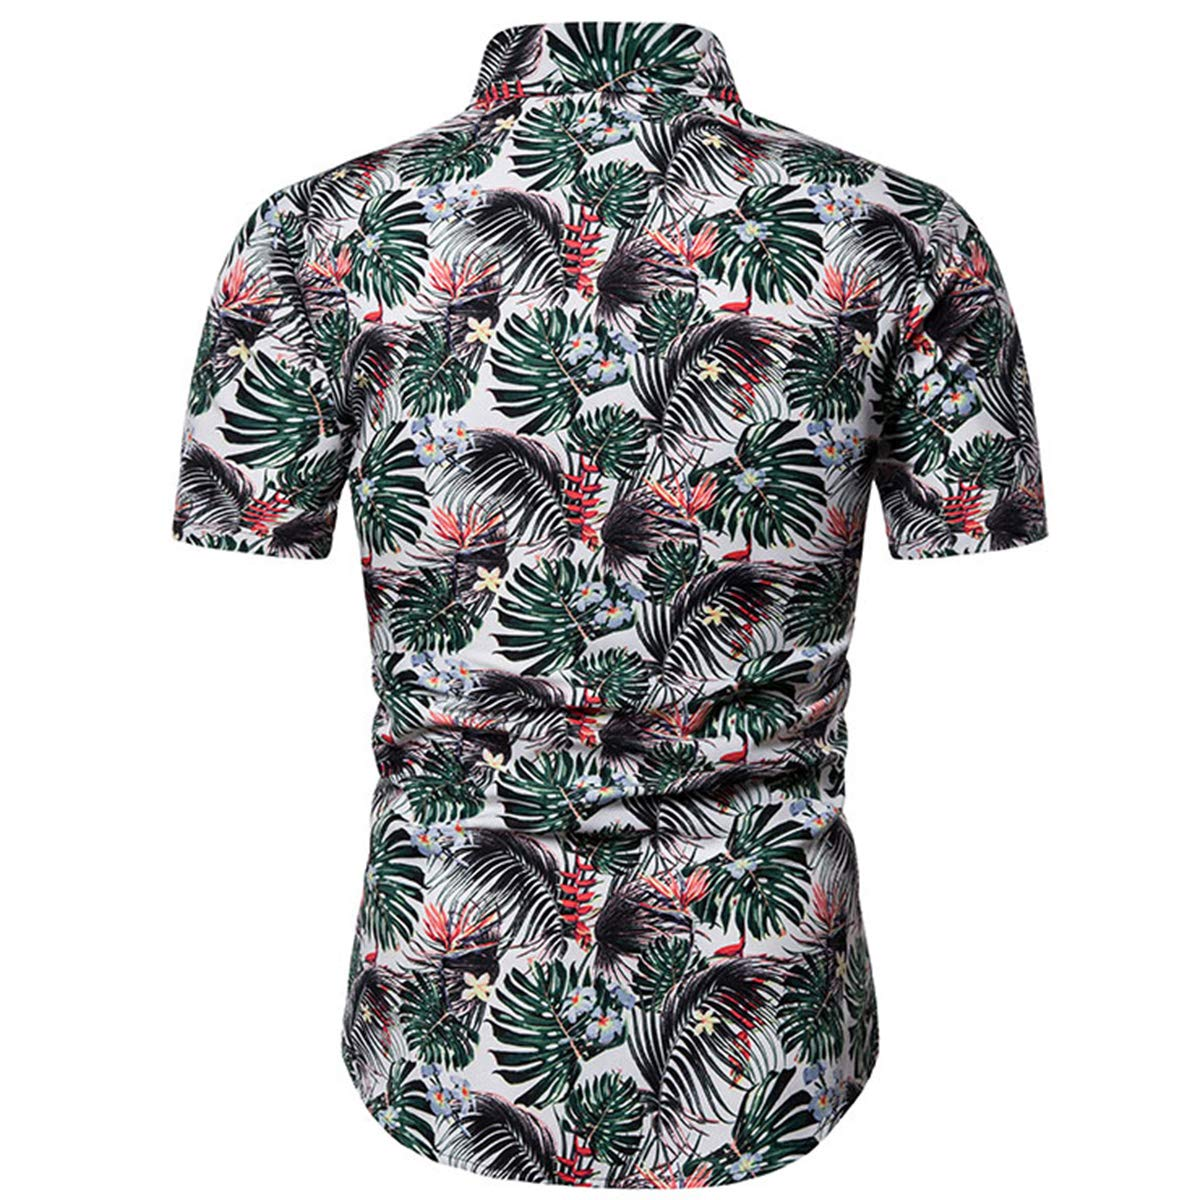 Hawaiian Shirts for Men Short Sleeve Regular Fit Floral Fashion Shirts Tropical Beach Holiday Button Down Shirt